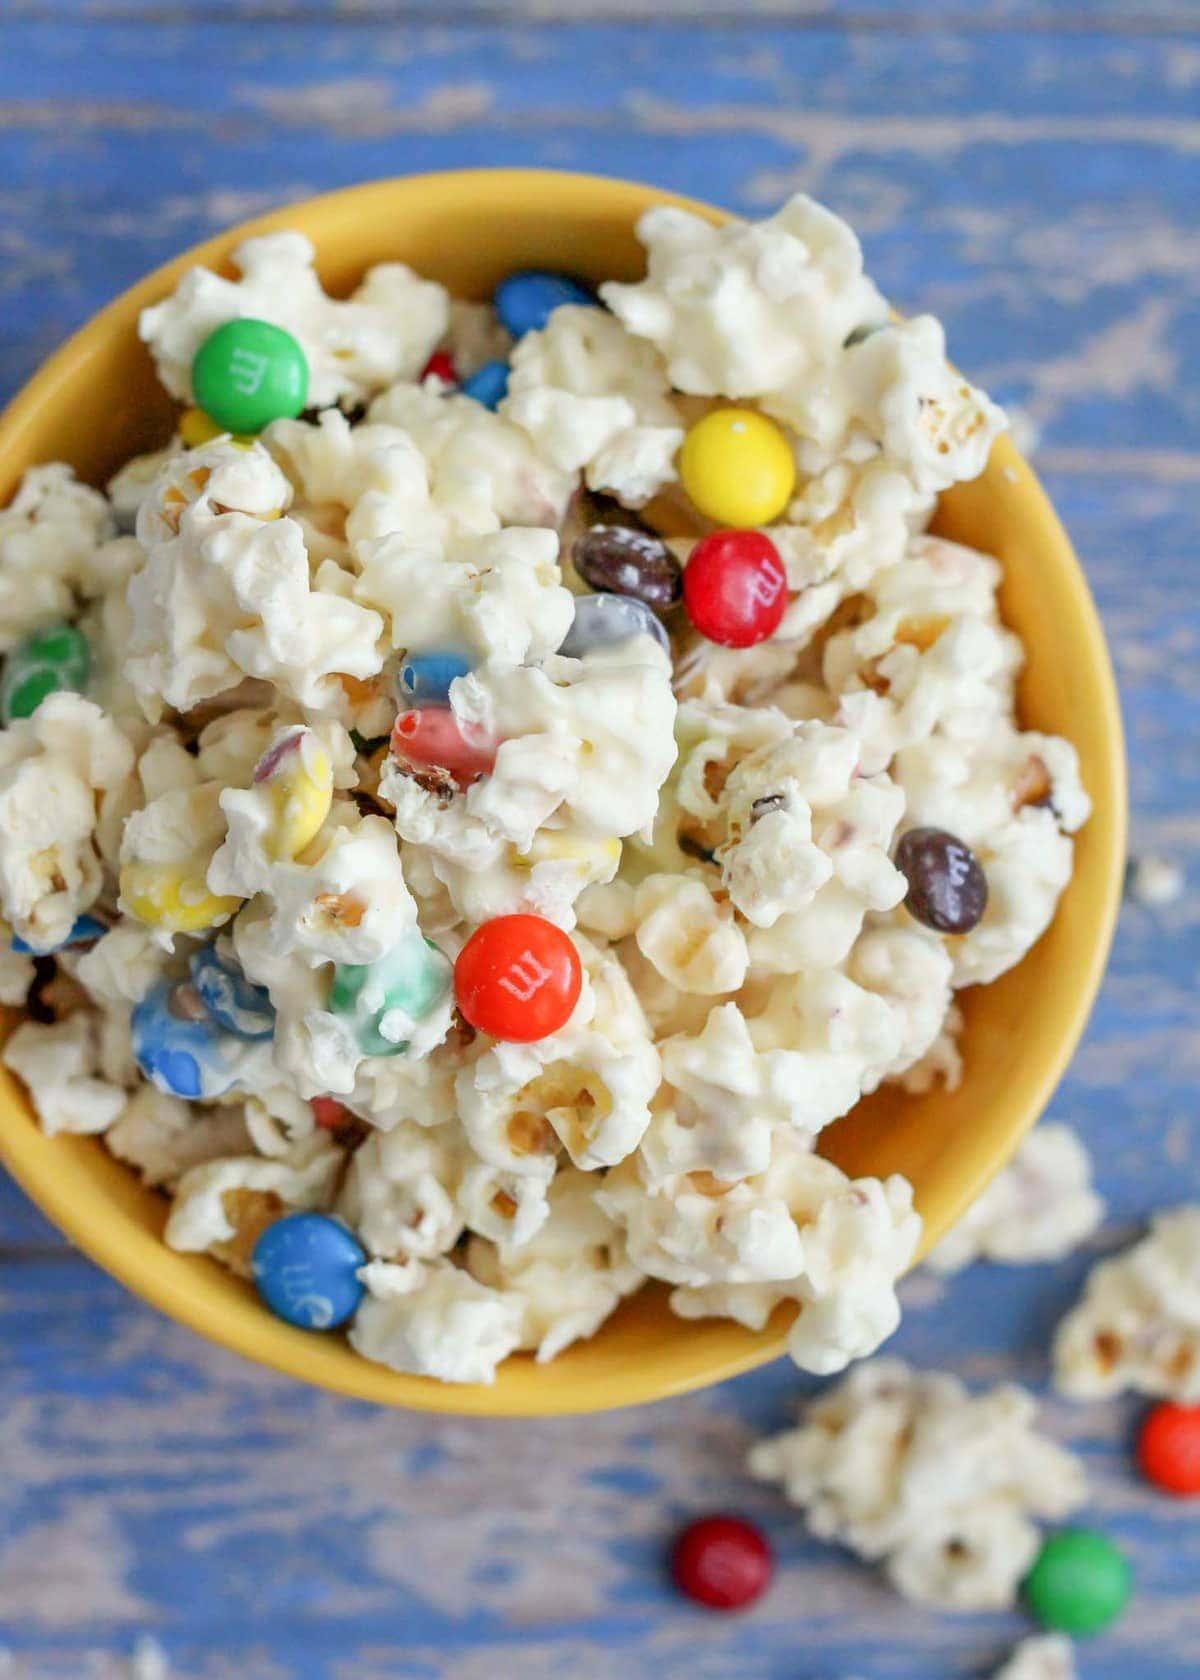 White chocolate popcorn recipe with M&Ms